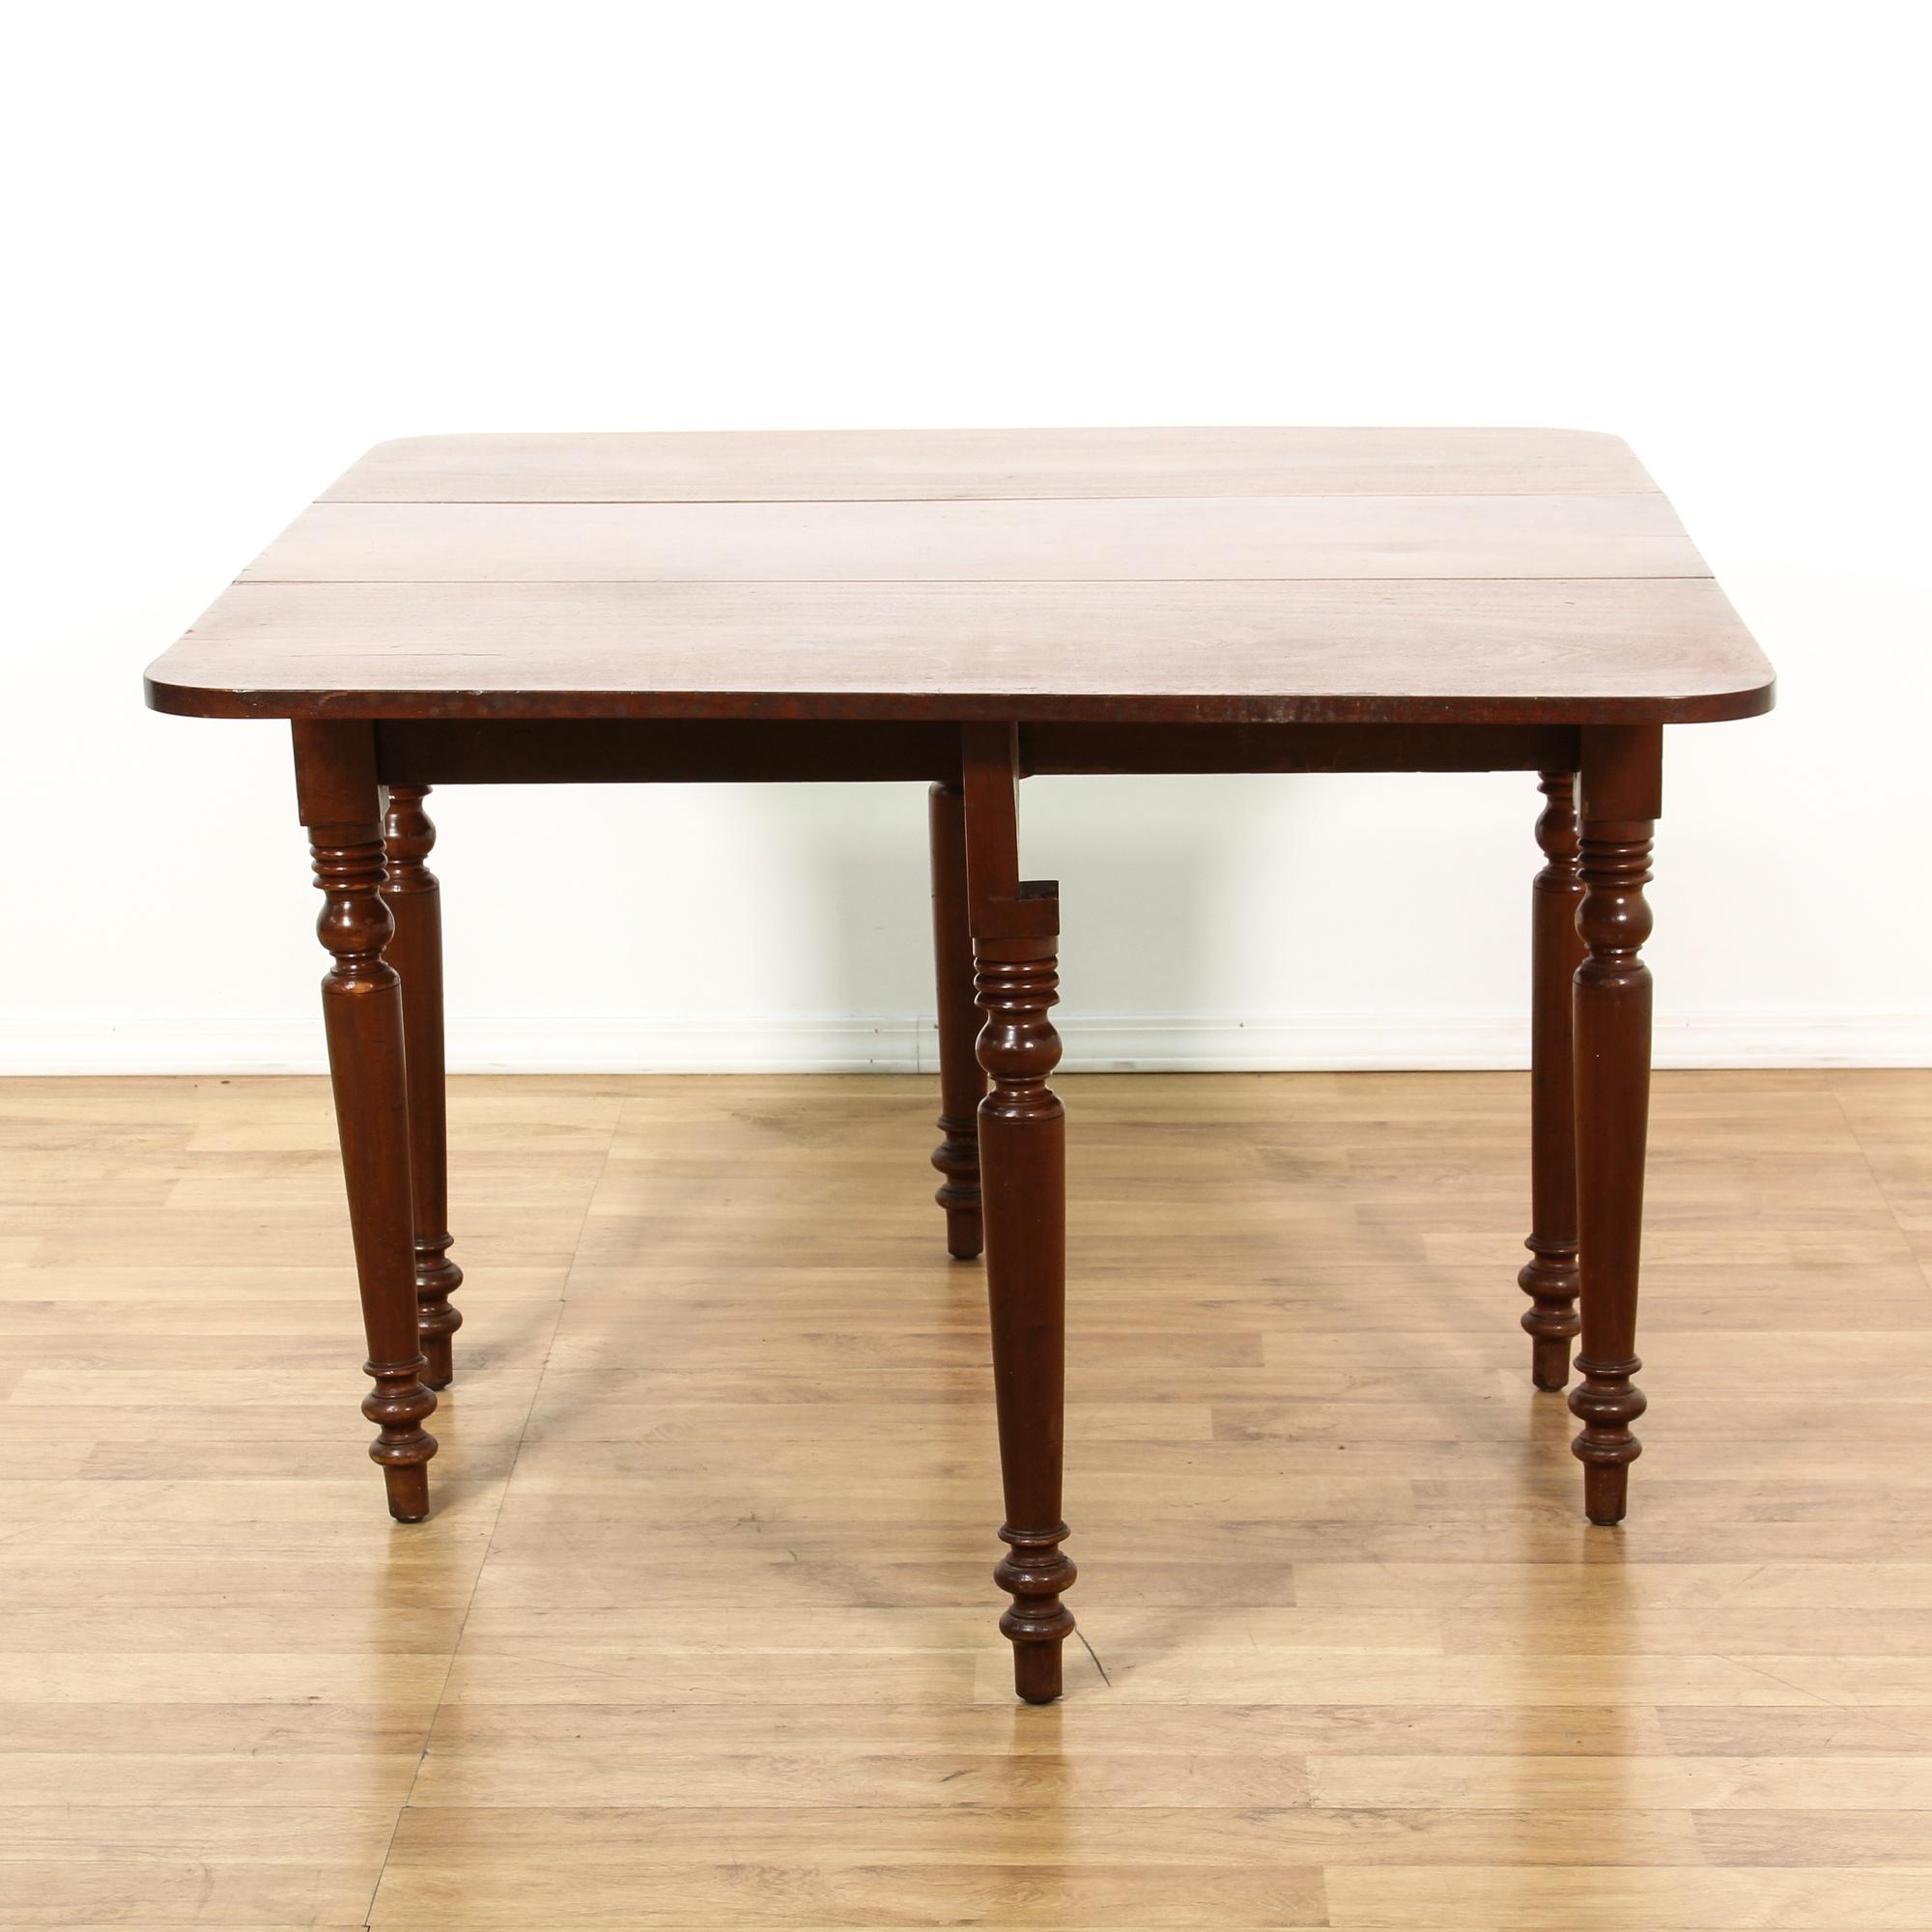 Dining Room Furniture San Diego: Mahogany Drop Leaf Gate Leg Dining Table